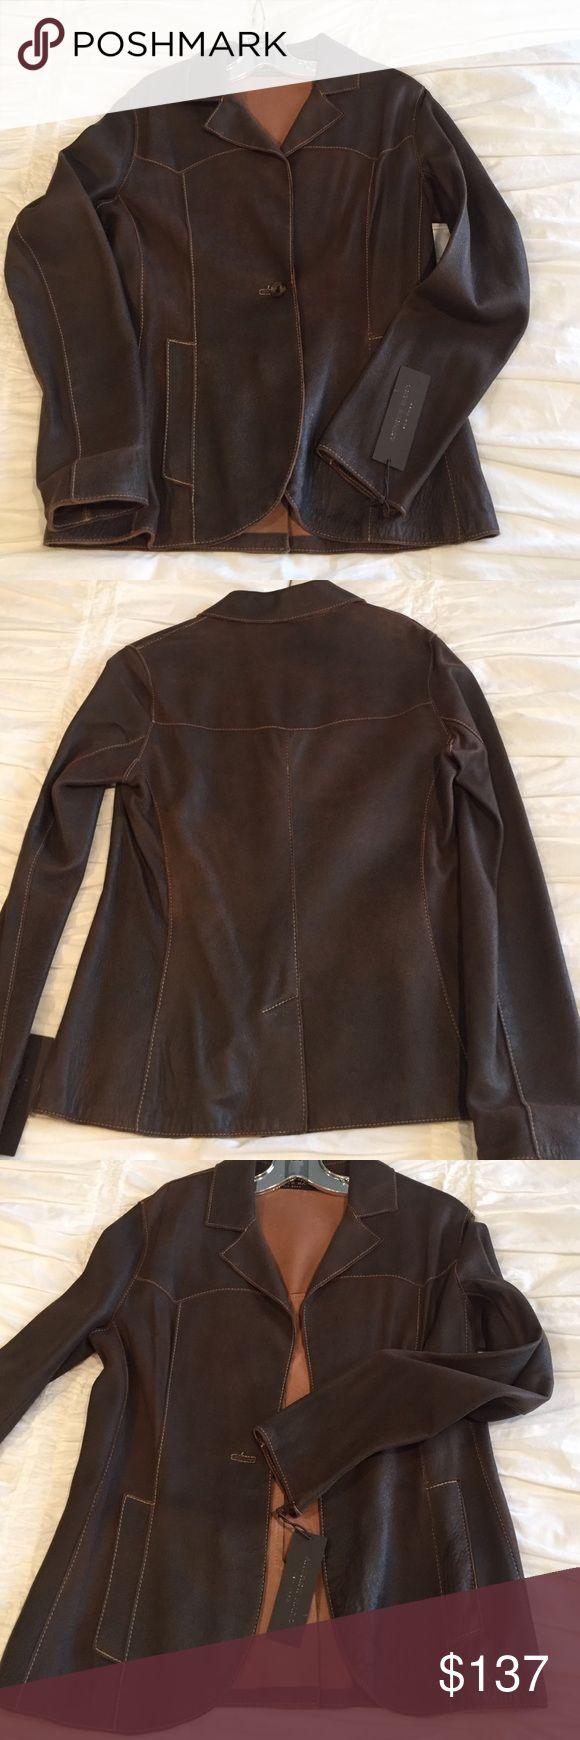 Andrew Marc leather blazer Andrew Marc brown leather-blazer with stitching never worn Andrew Marc Jackets & Coats Blazers